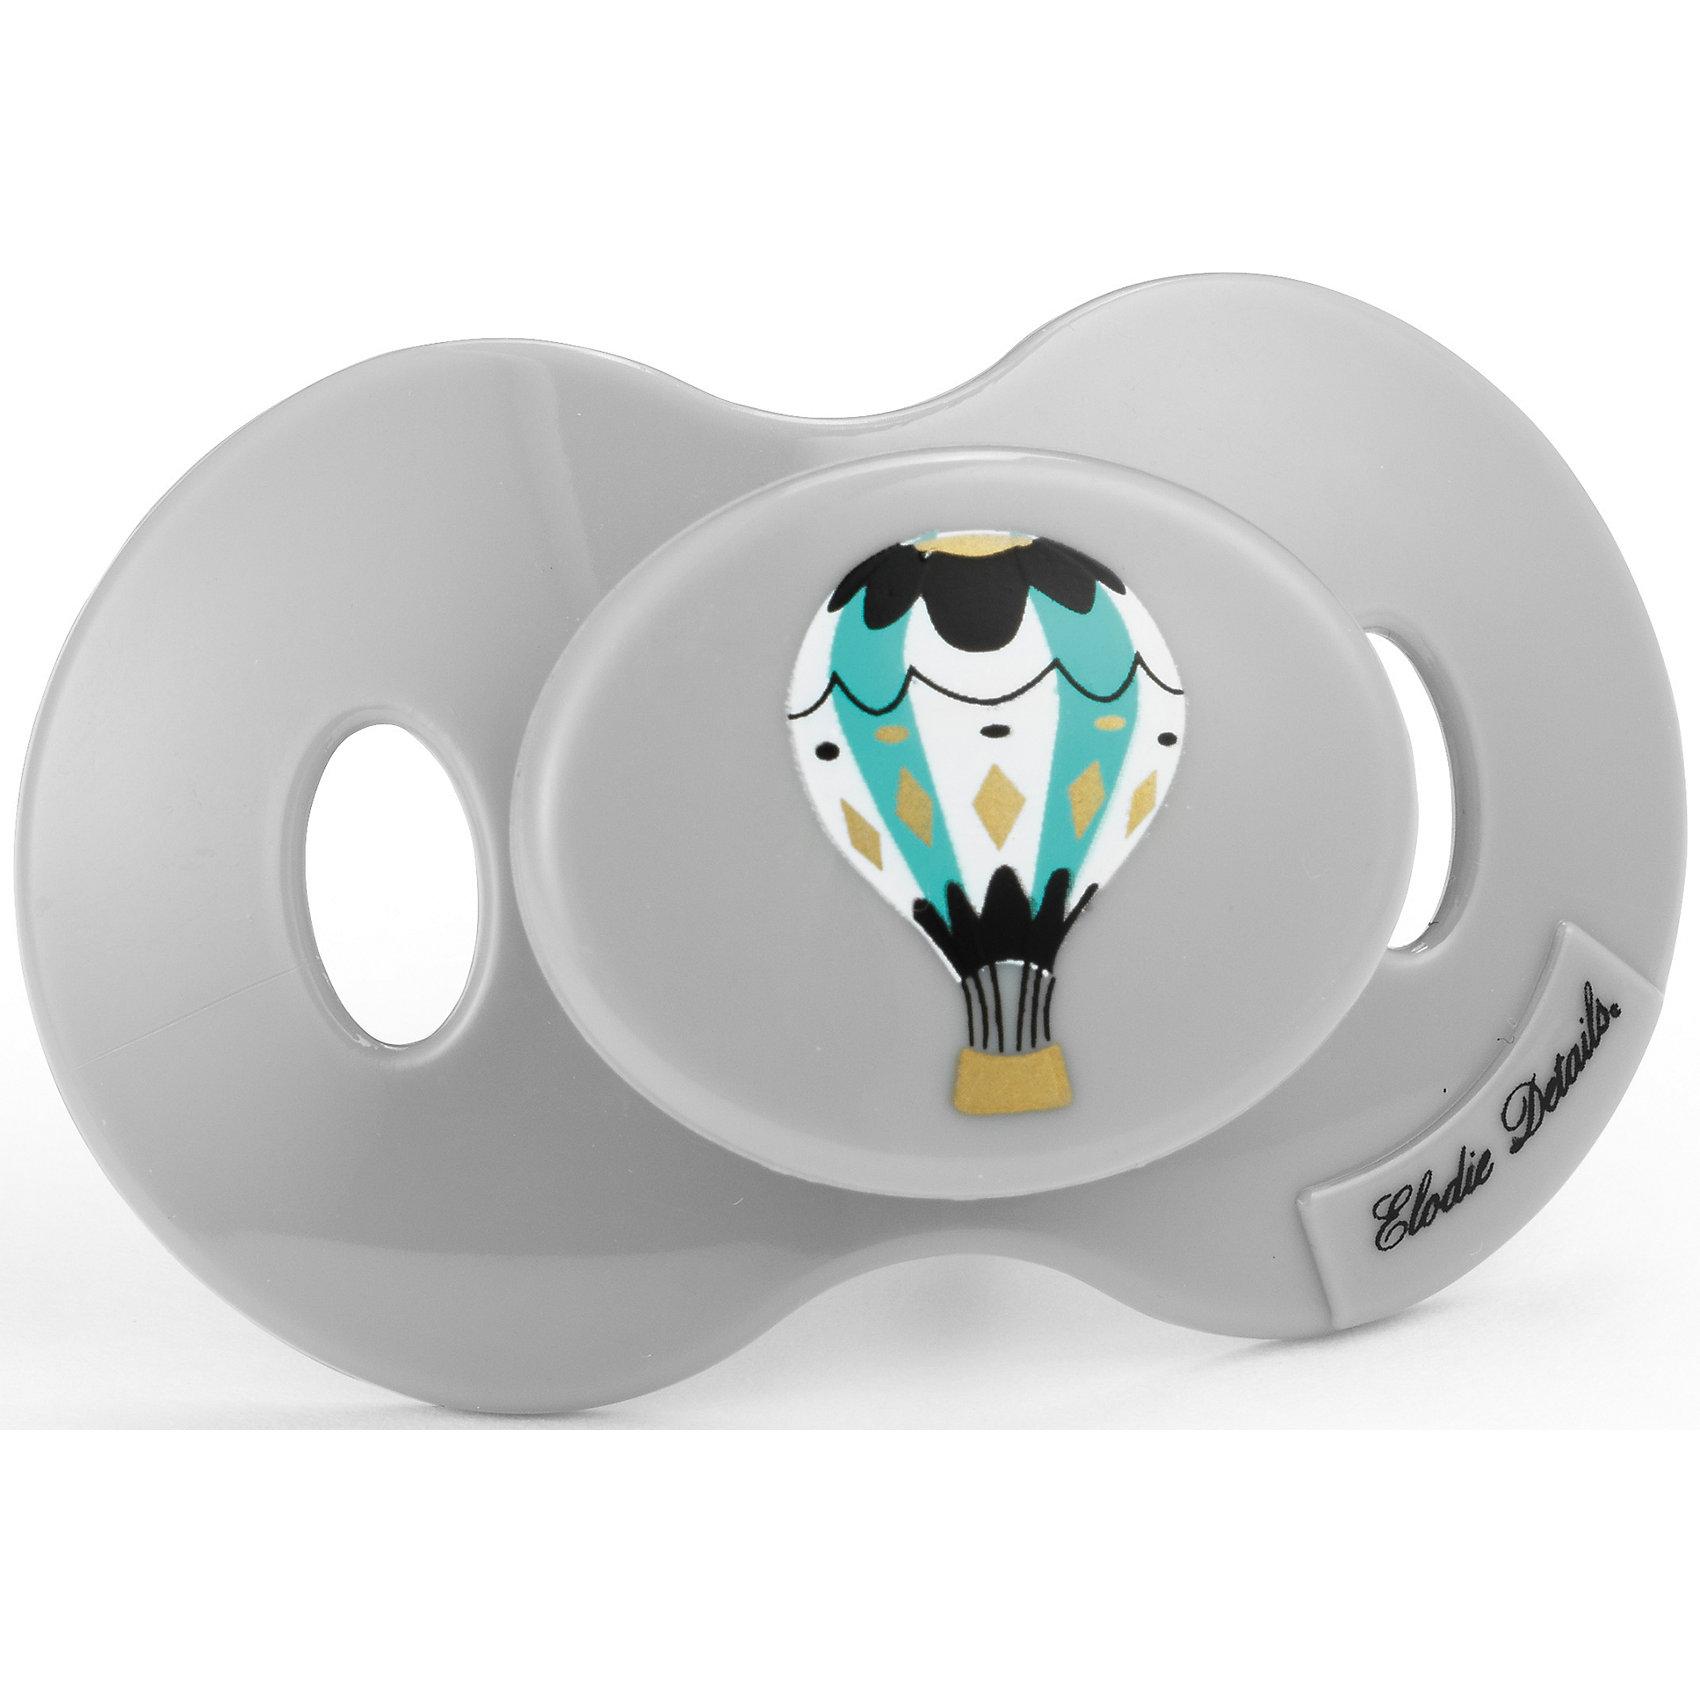 Пустышка силиконовая Moon Balloon, 3-12мес., Elodie Details